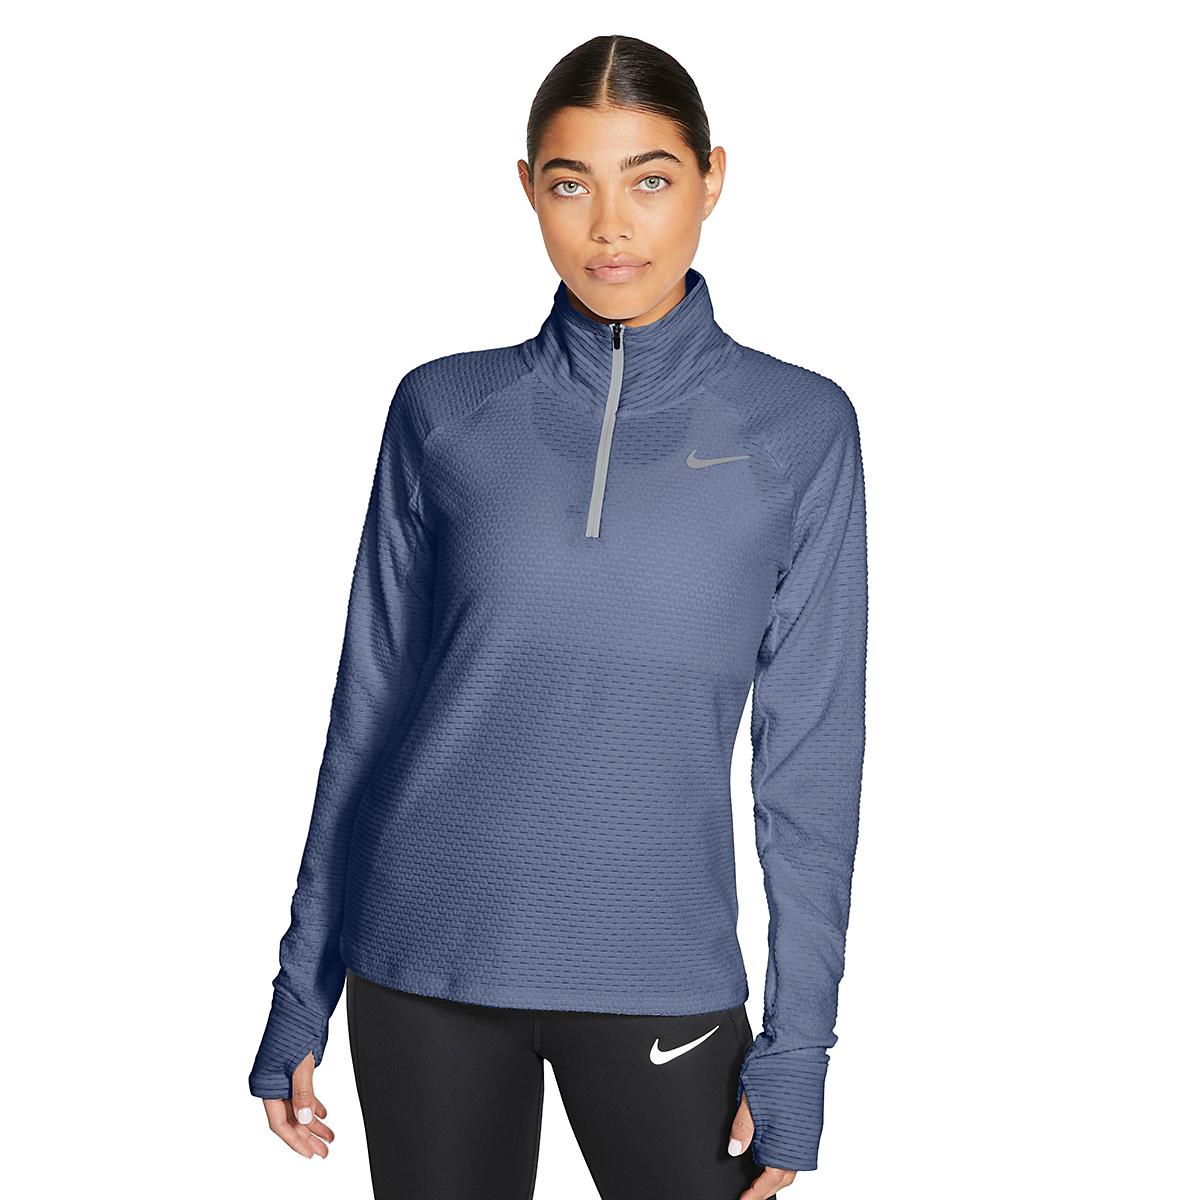 Women's Nike Sphere Half Zip Long Sleeve Shirt - Color: World Indigo/Reflective Silver - Size: XS, World Indigo/Reflective Silver, large, image 3